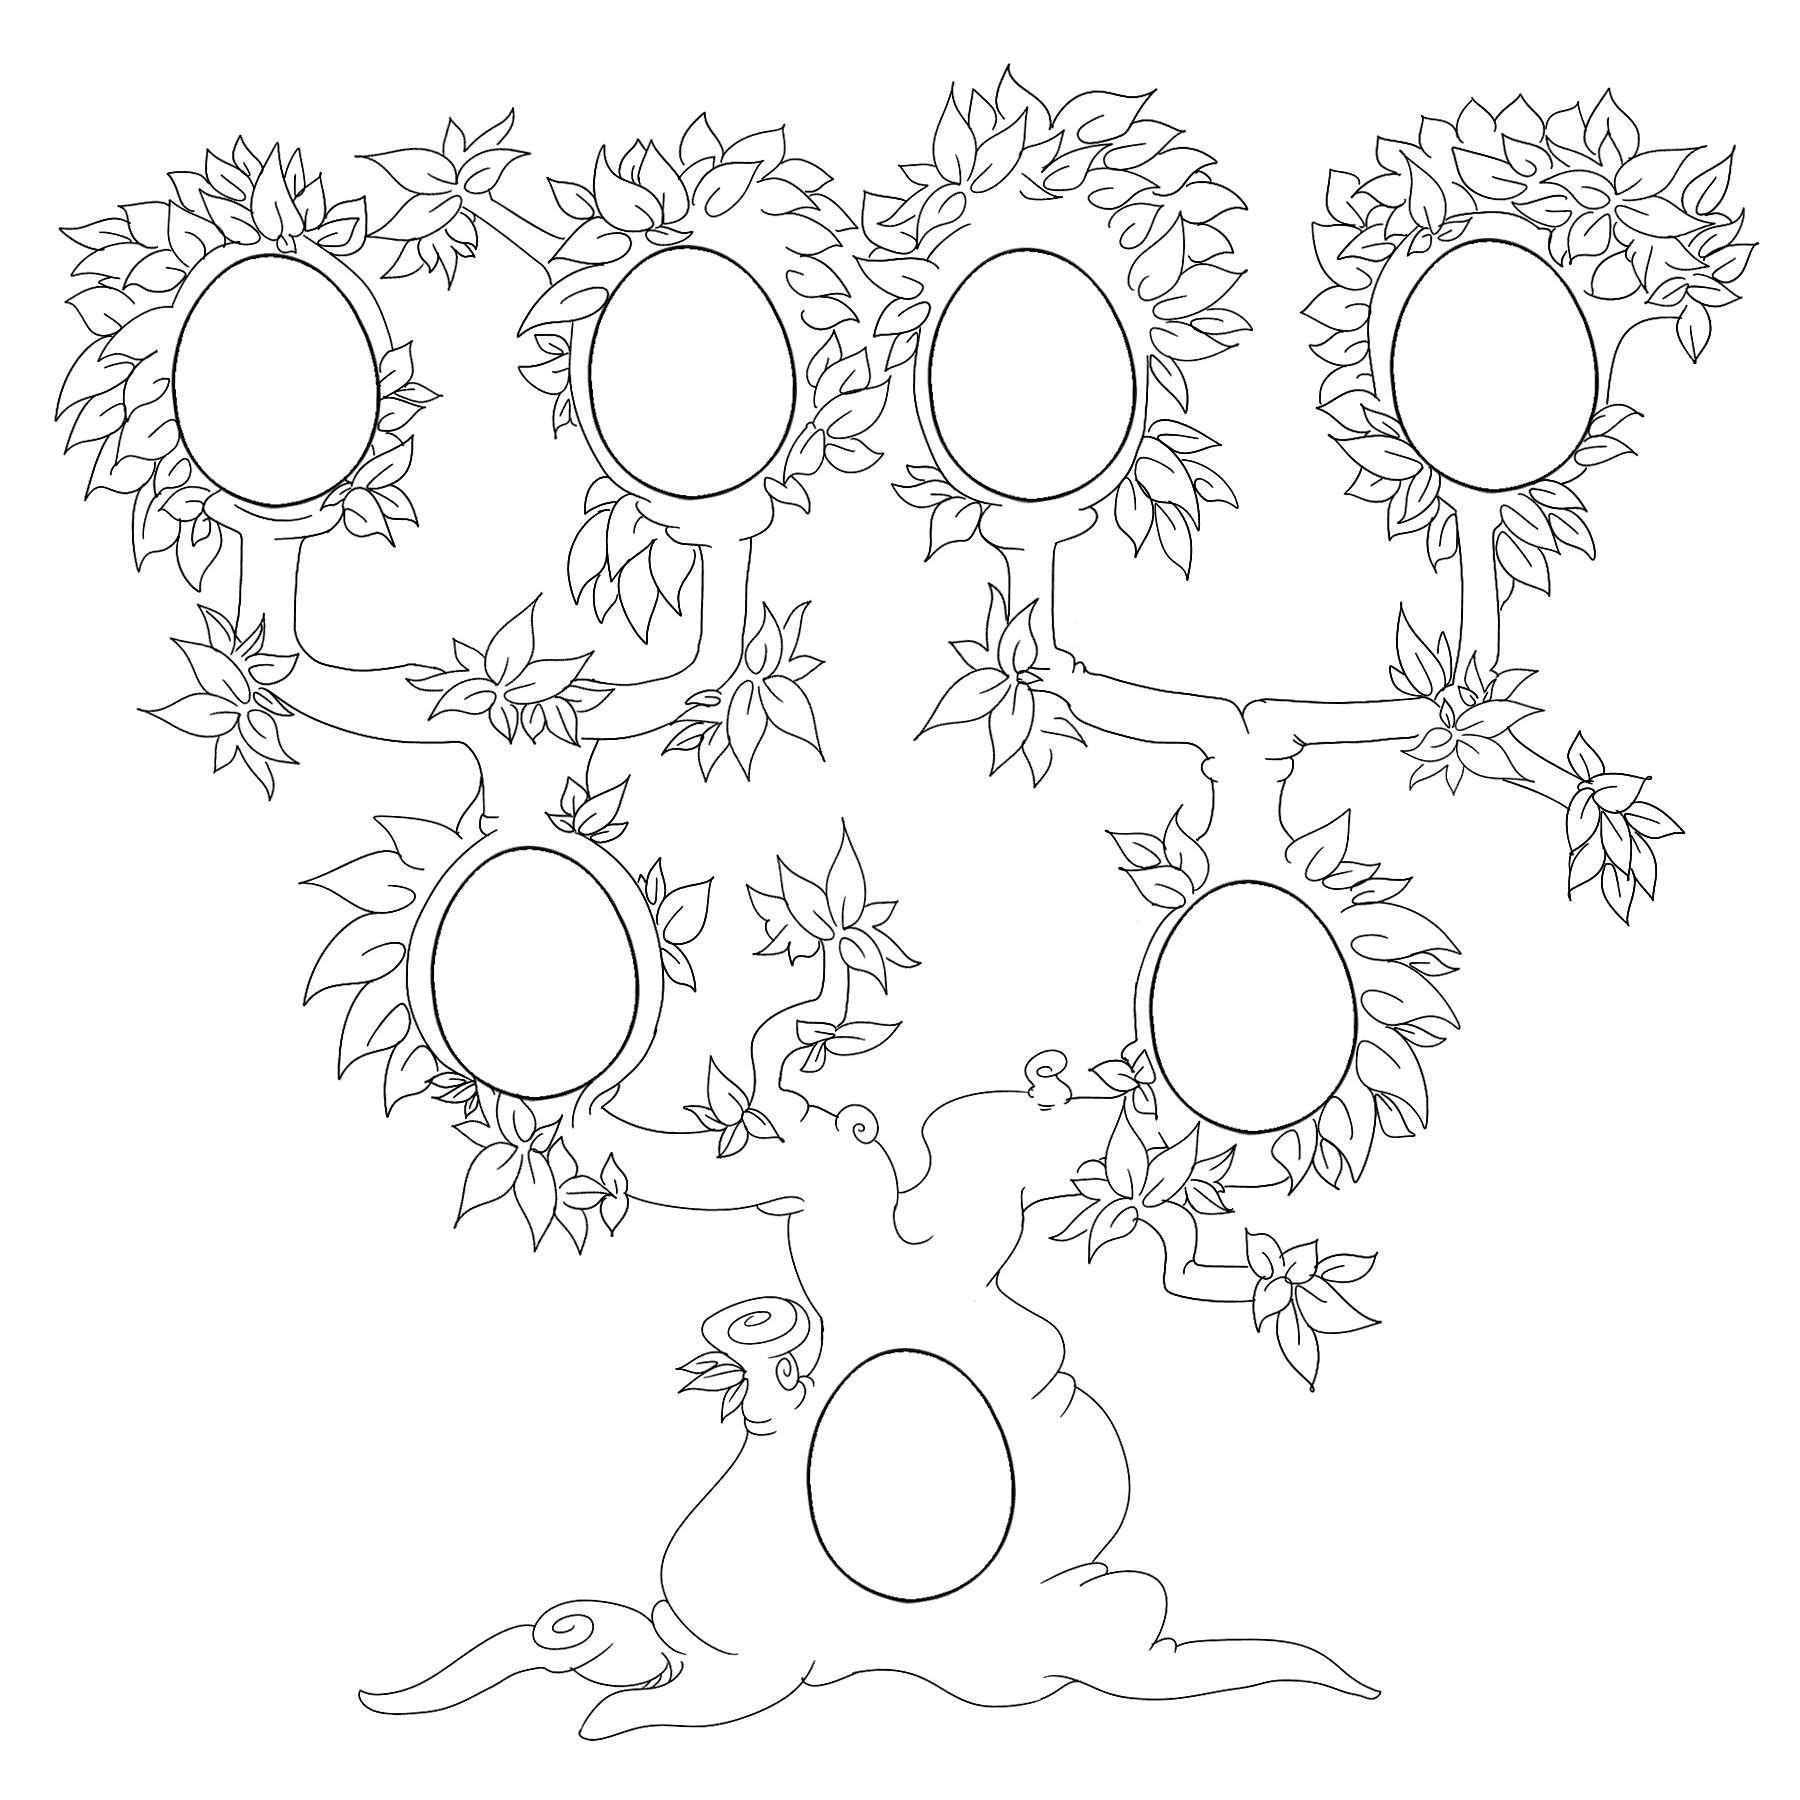 reiki_familytree